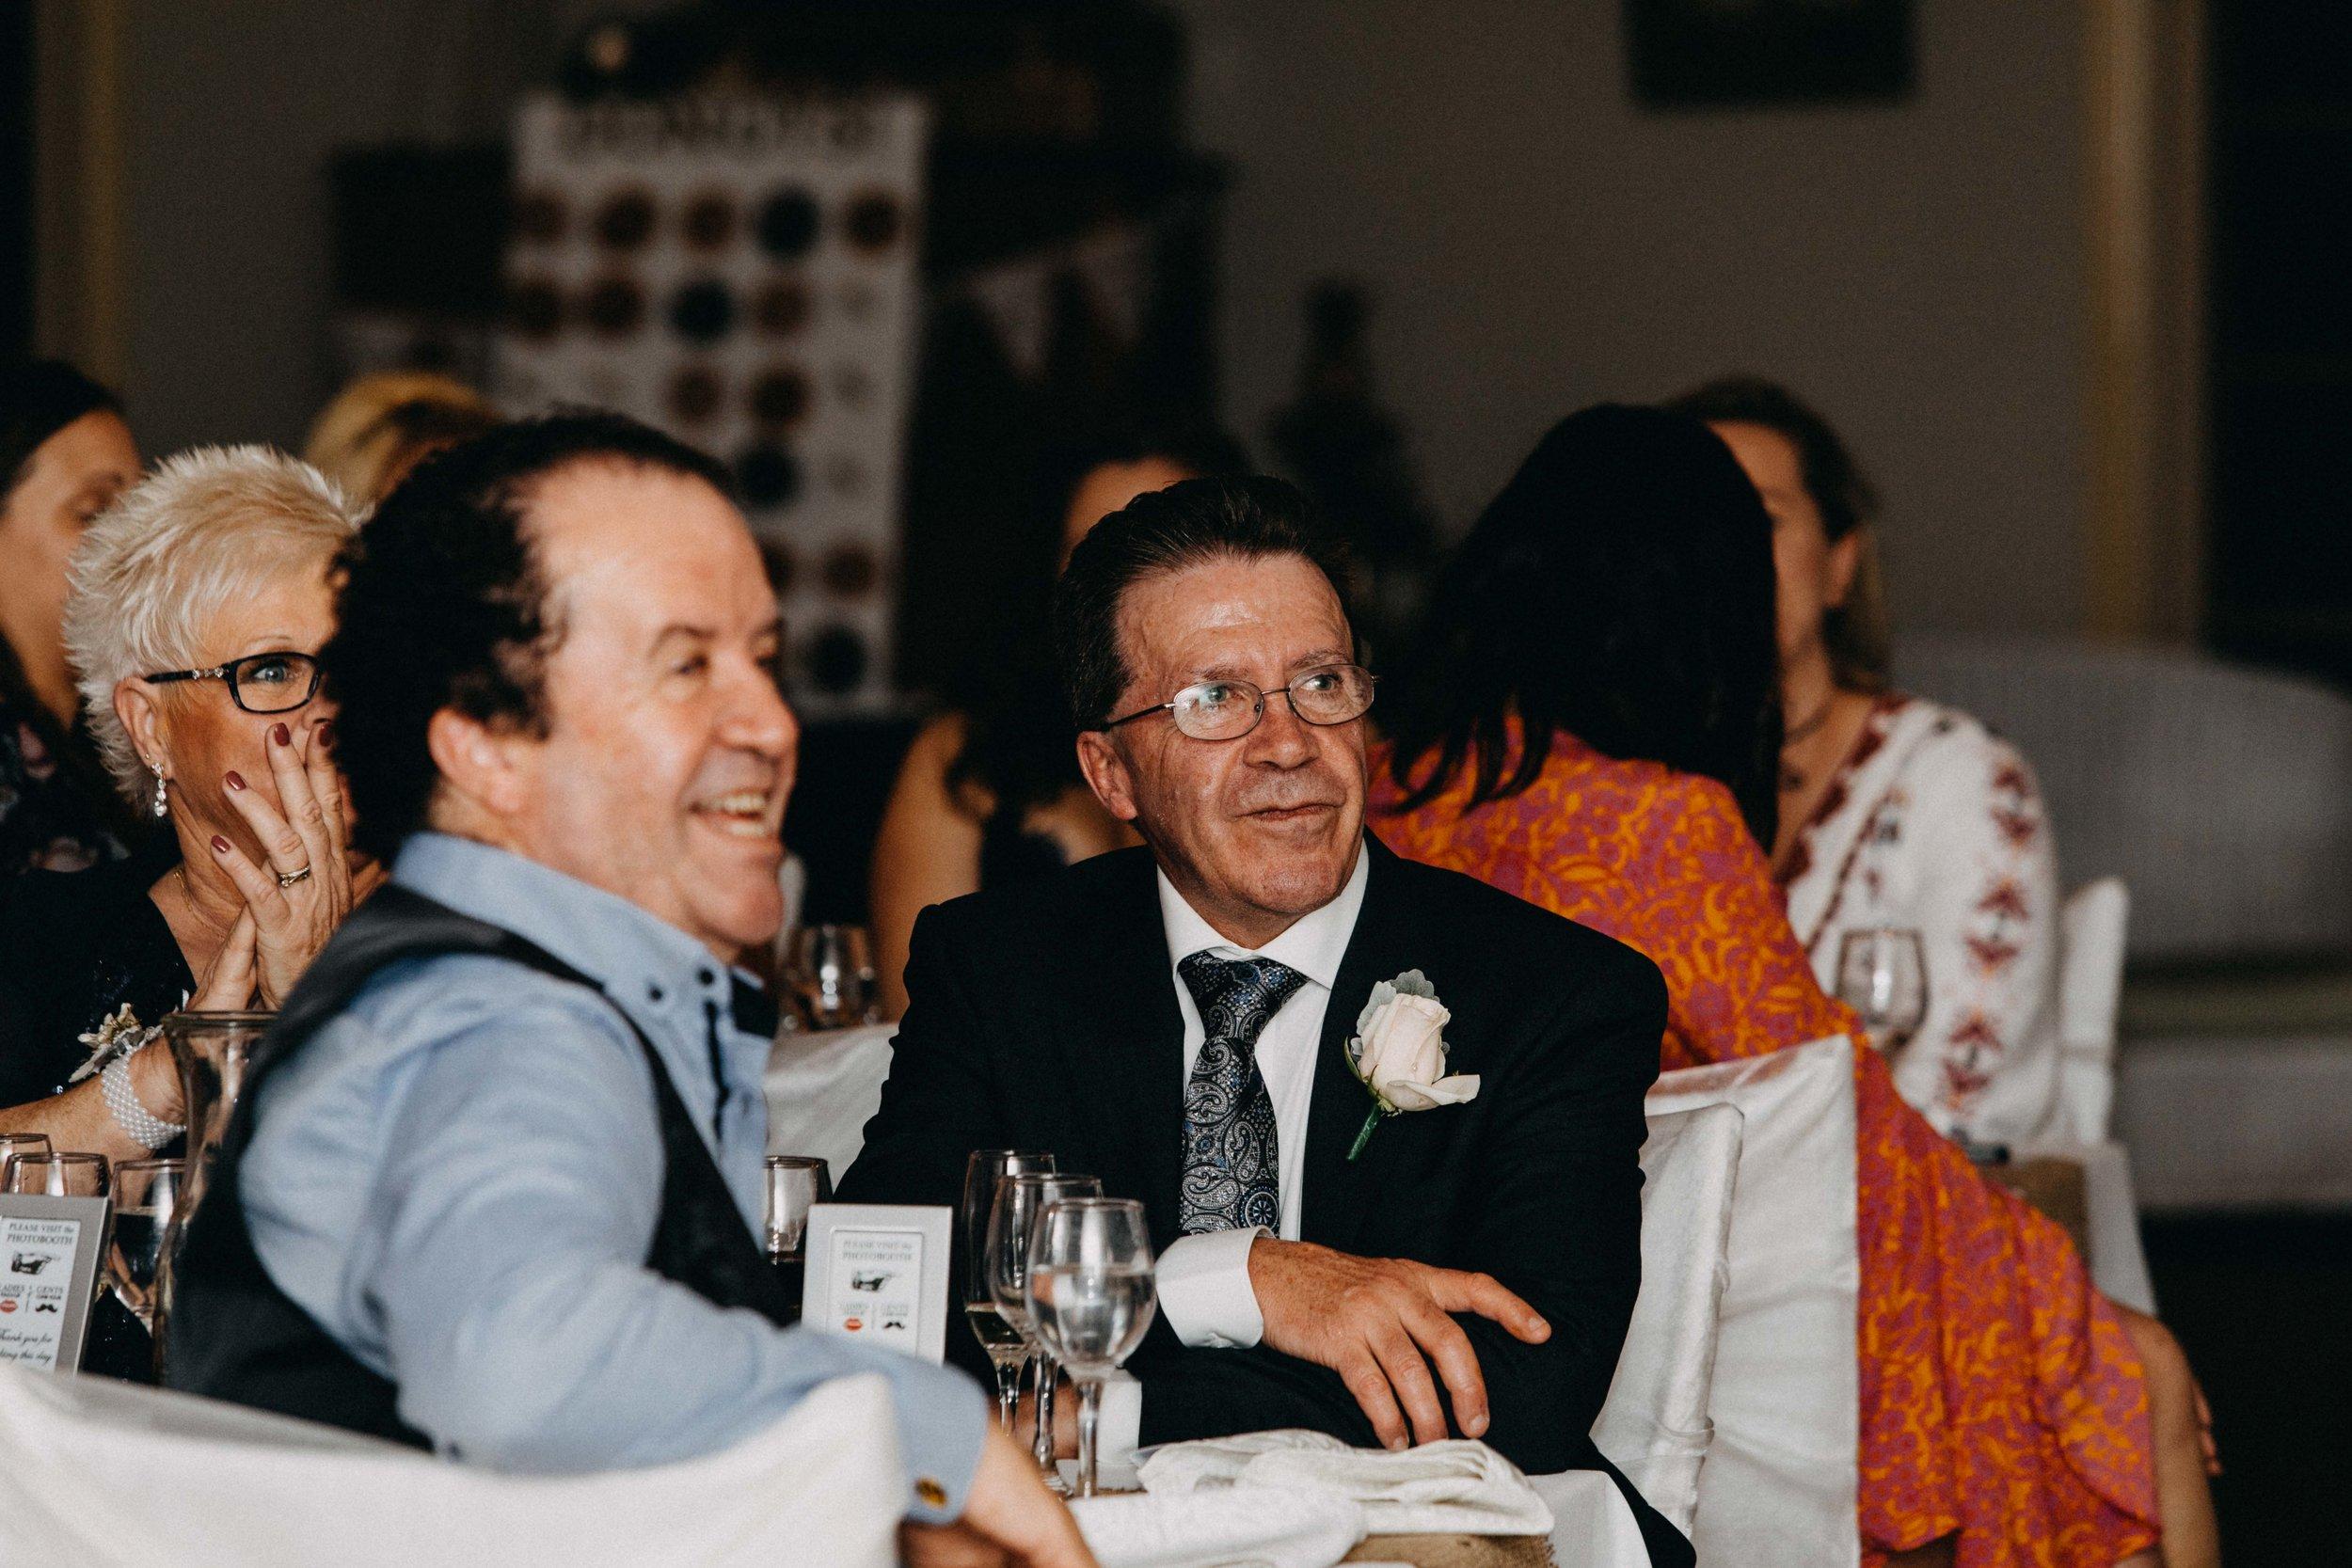 appin-house-wedding-macarthur-www.emilyobrienphotography.net-171.jpg